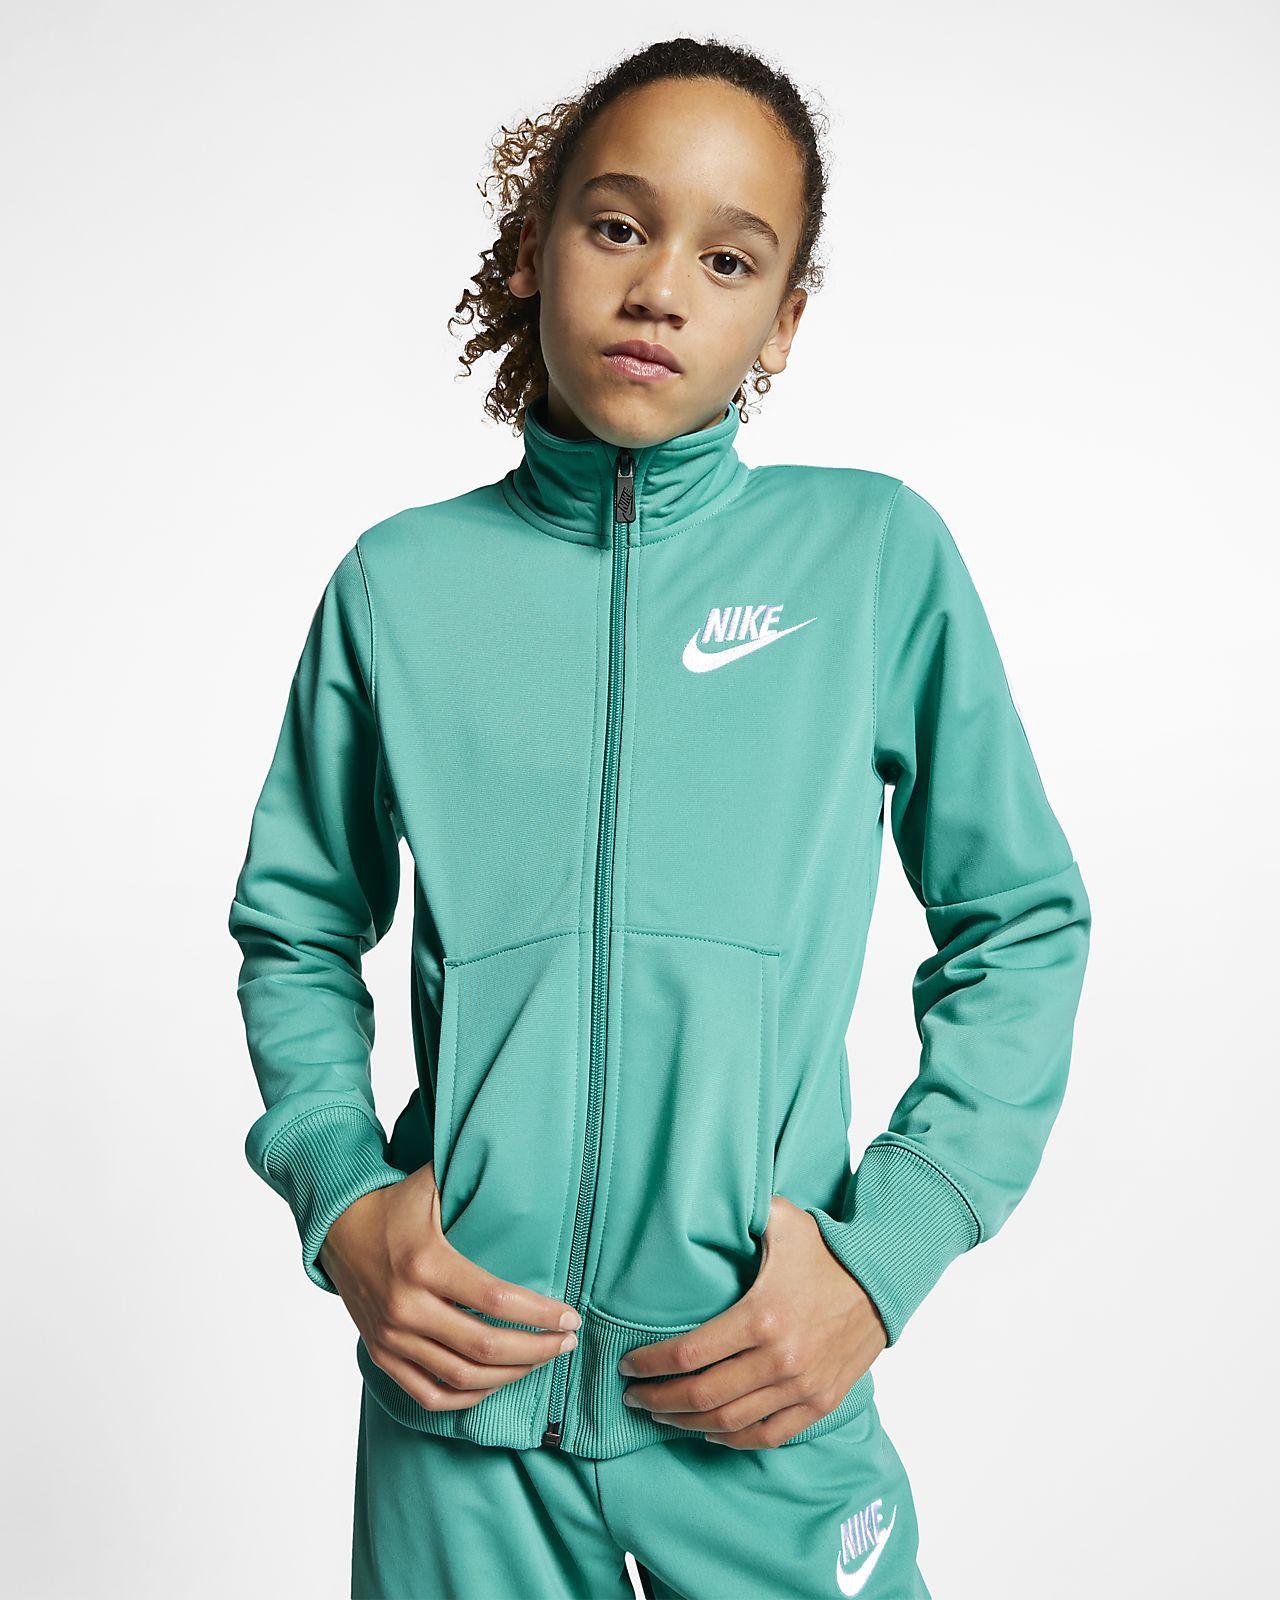 c8f36f55680f Nike Sportswear Big Kids  (Girls ) Tracksuit. Nike.com